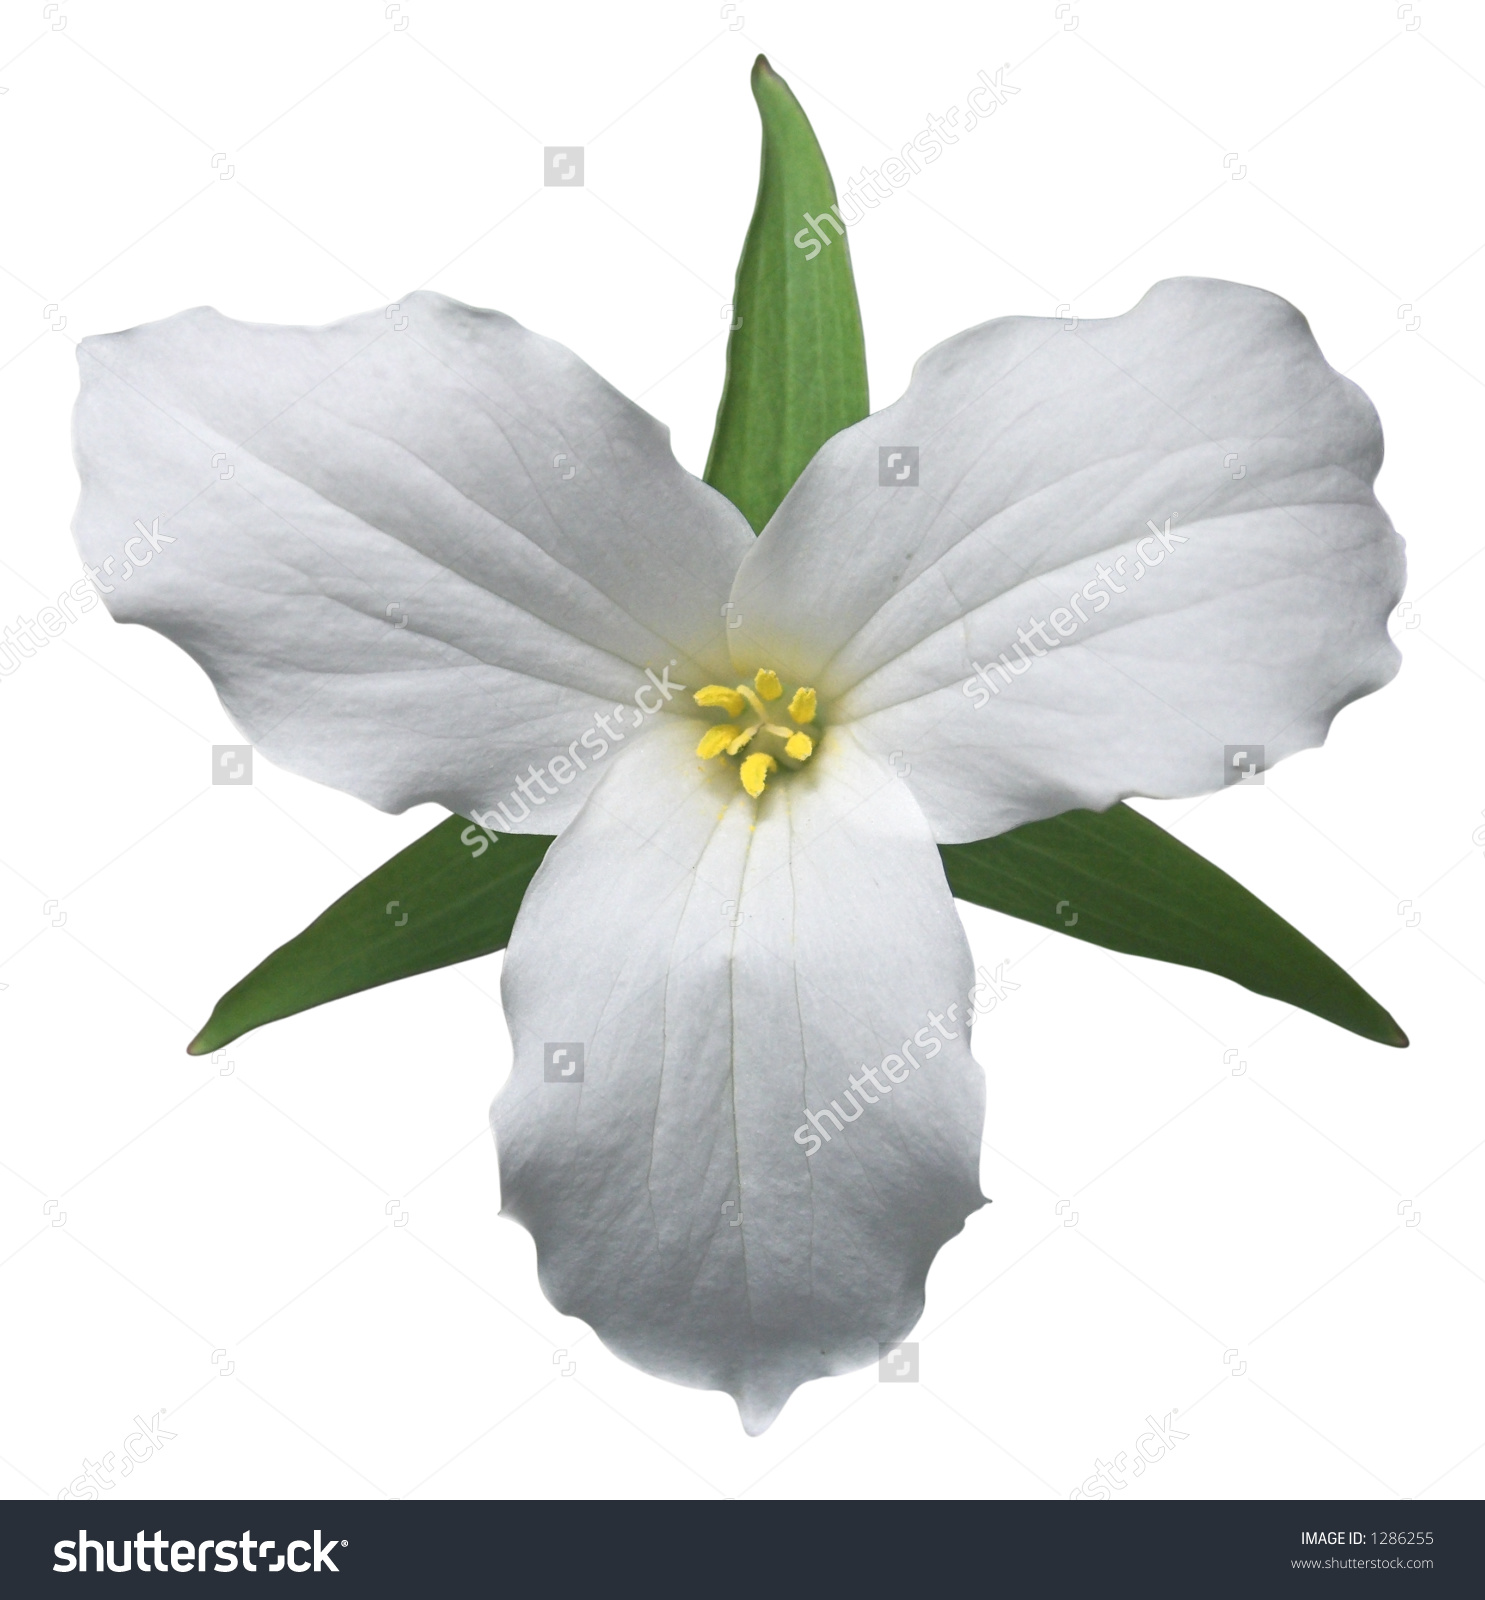 White Trillium Floral Emblem Ontario Path Stock Photo 1286255.